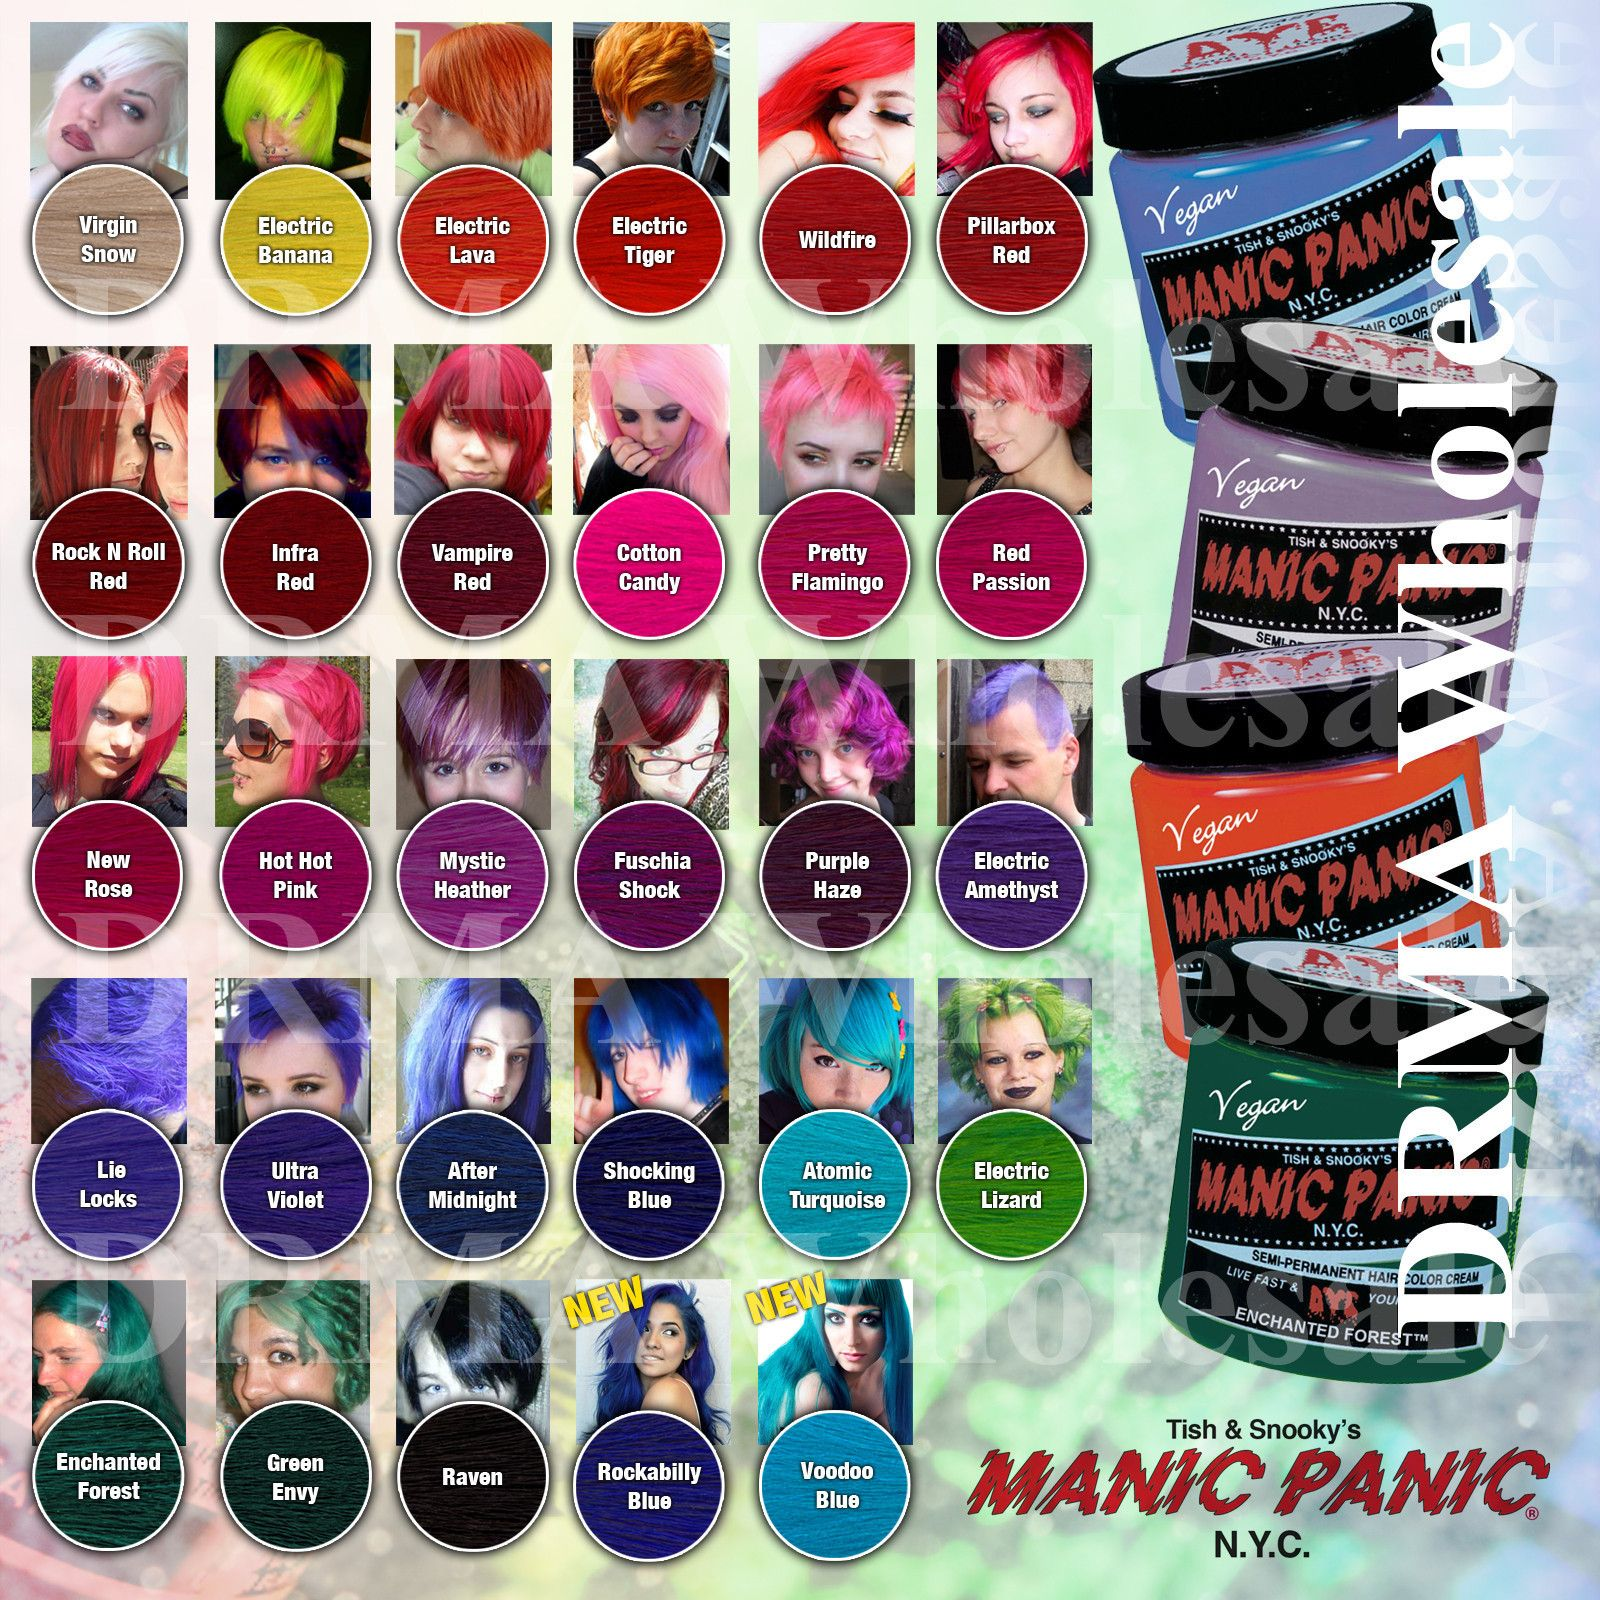 Manic Panic Classic Semi Permanent Vegan Hair Dye Color All Colors 4 Oz New Manic Panic Hair Dye Hair Dye Colors Vegan Hair Dye